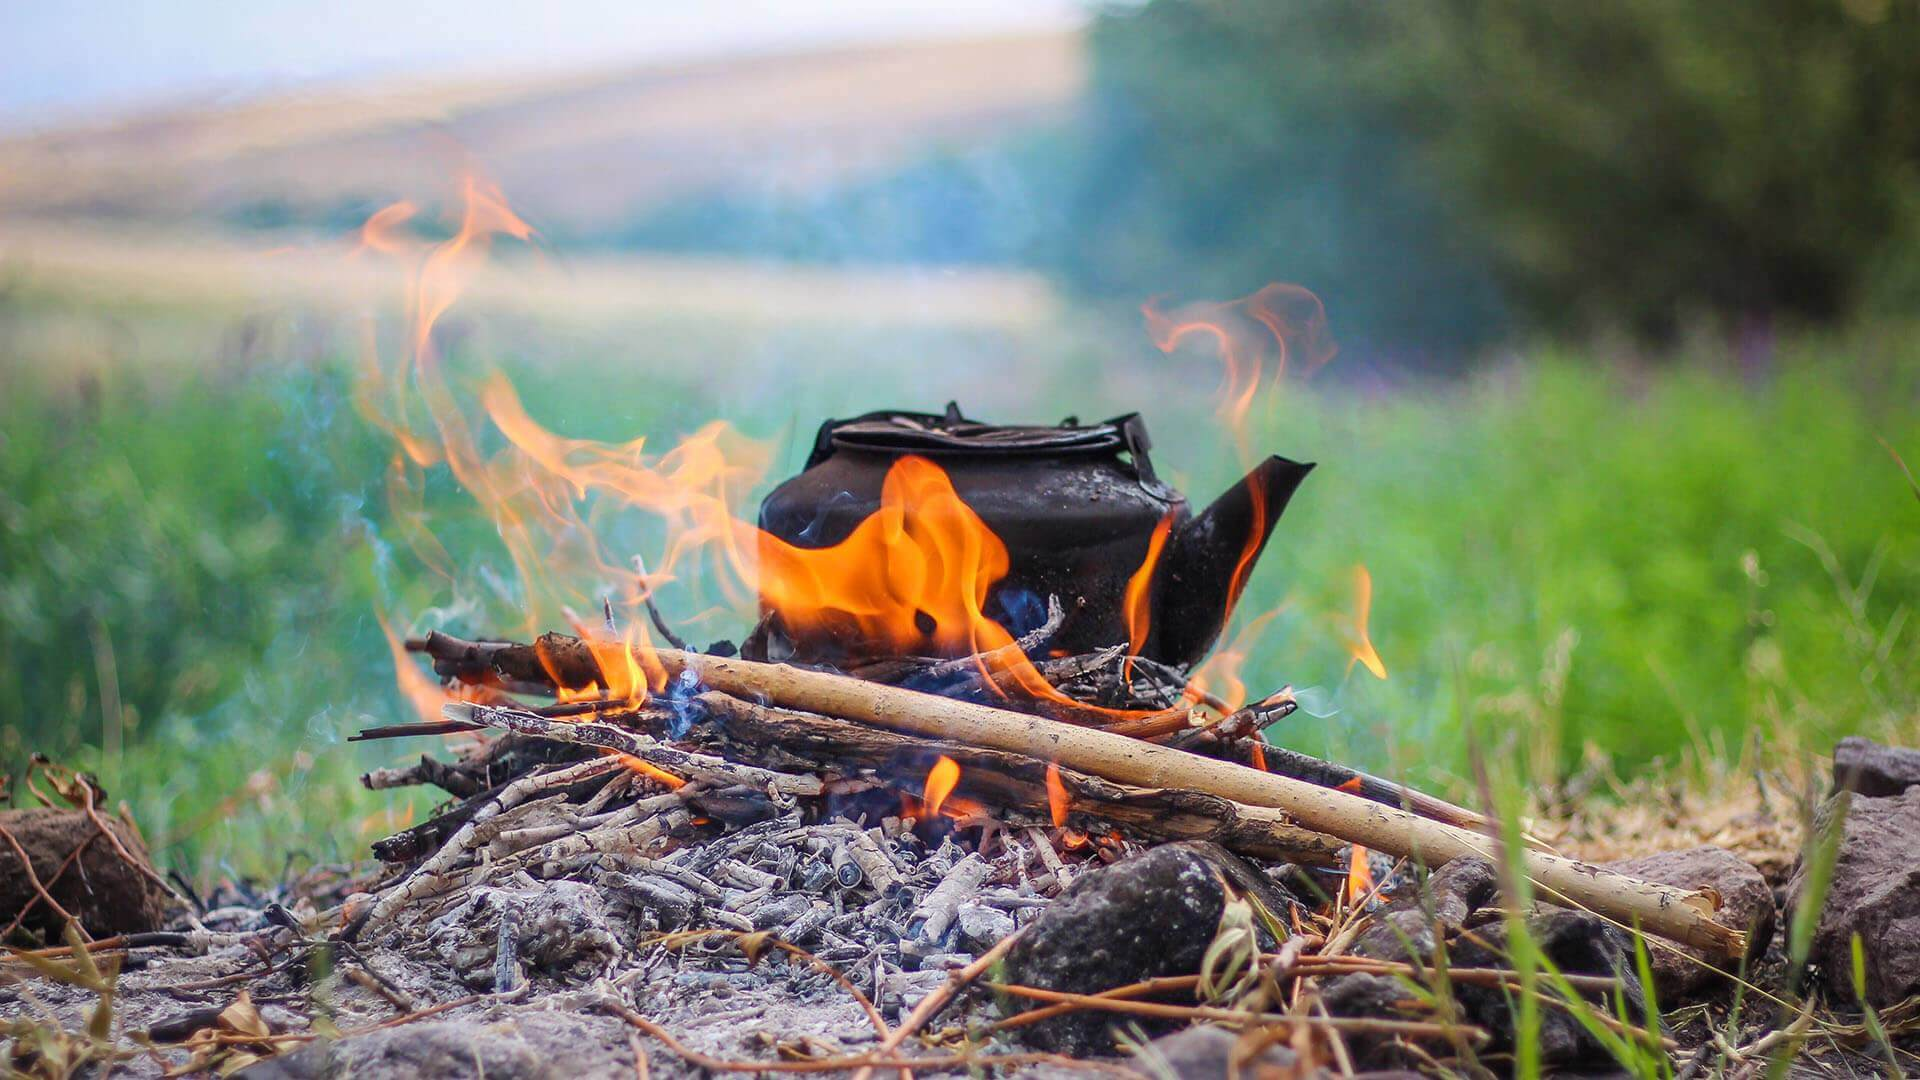 Afbeelding vuur